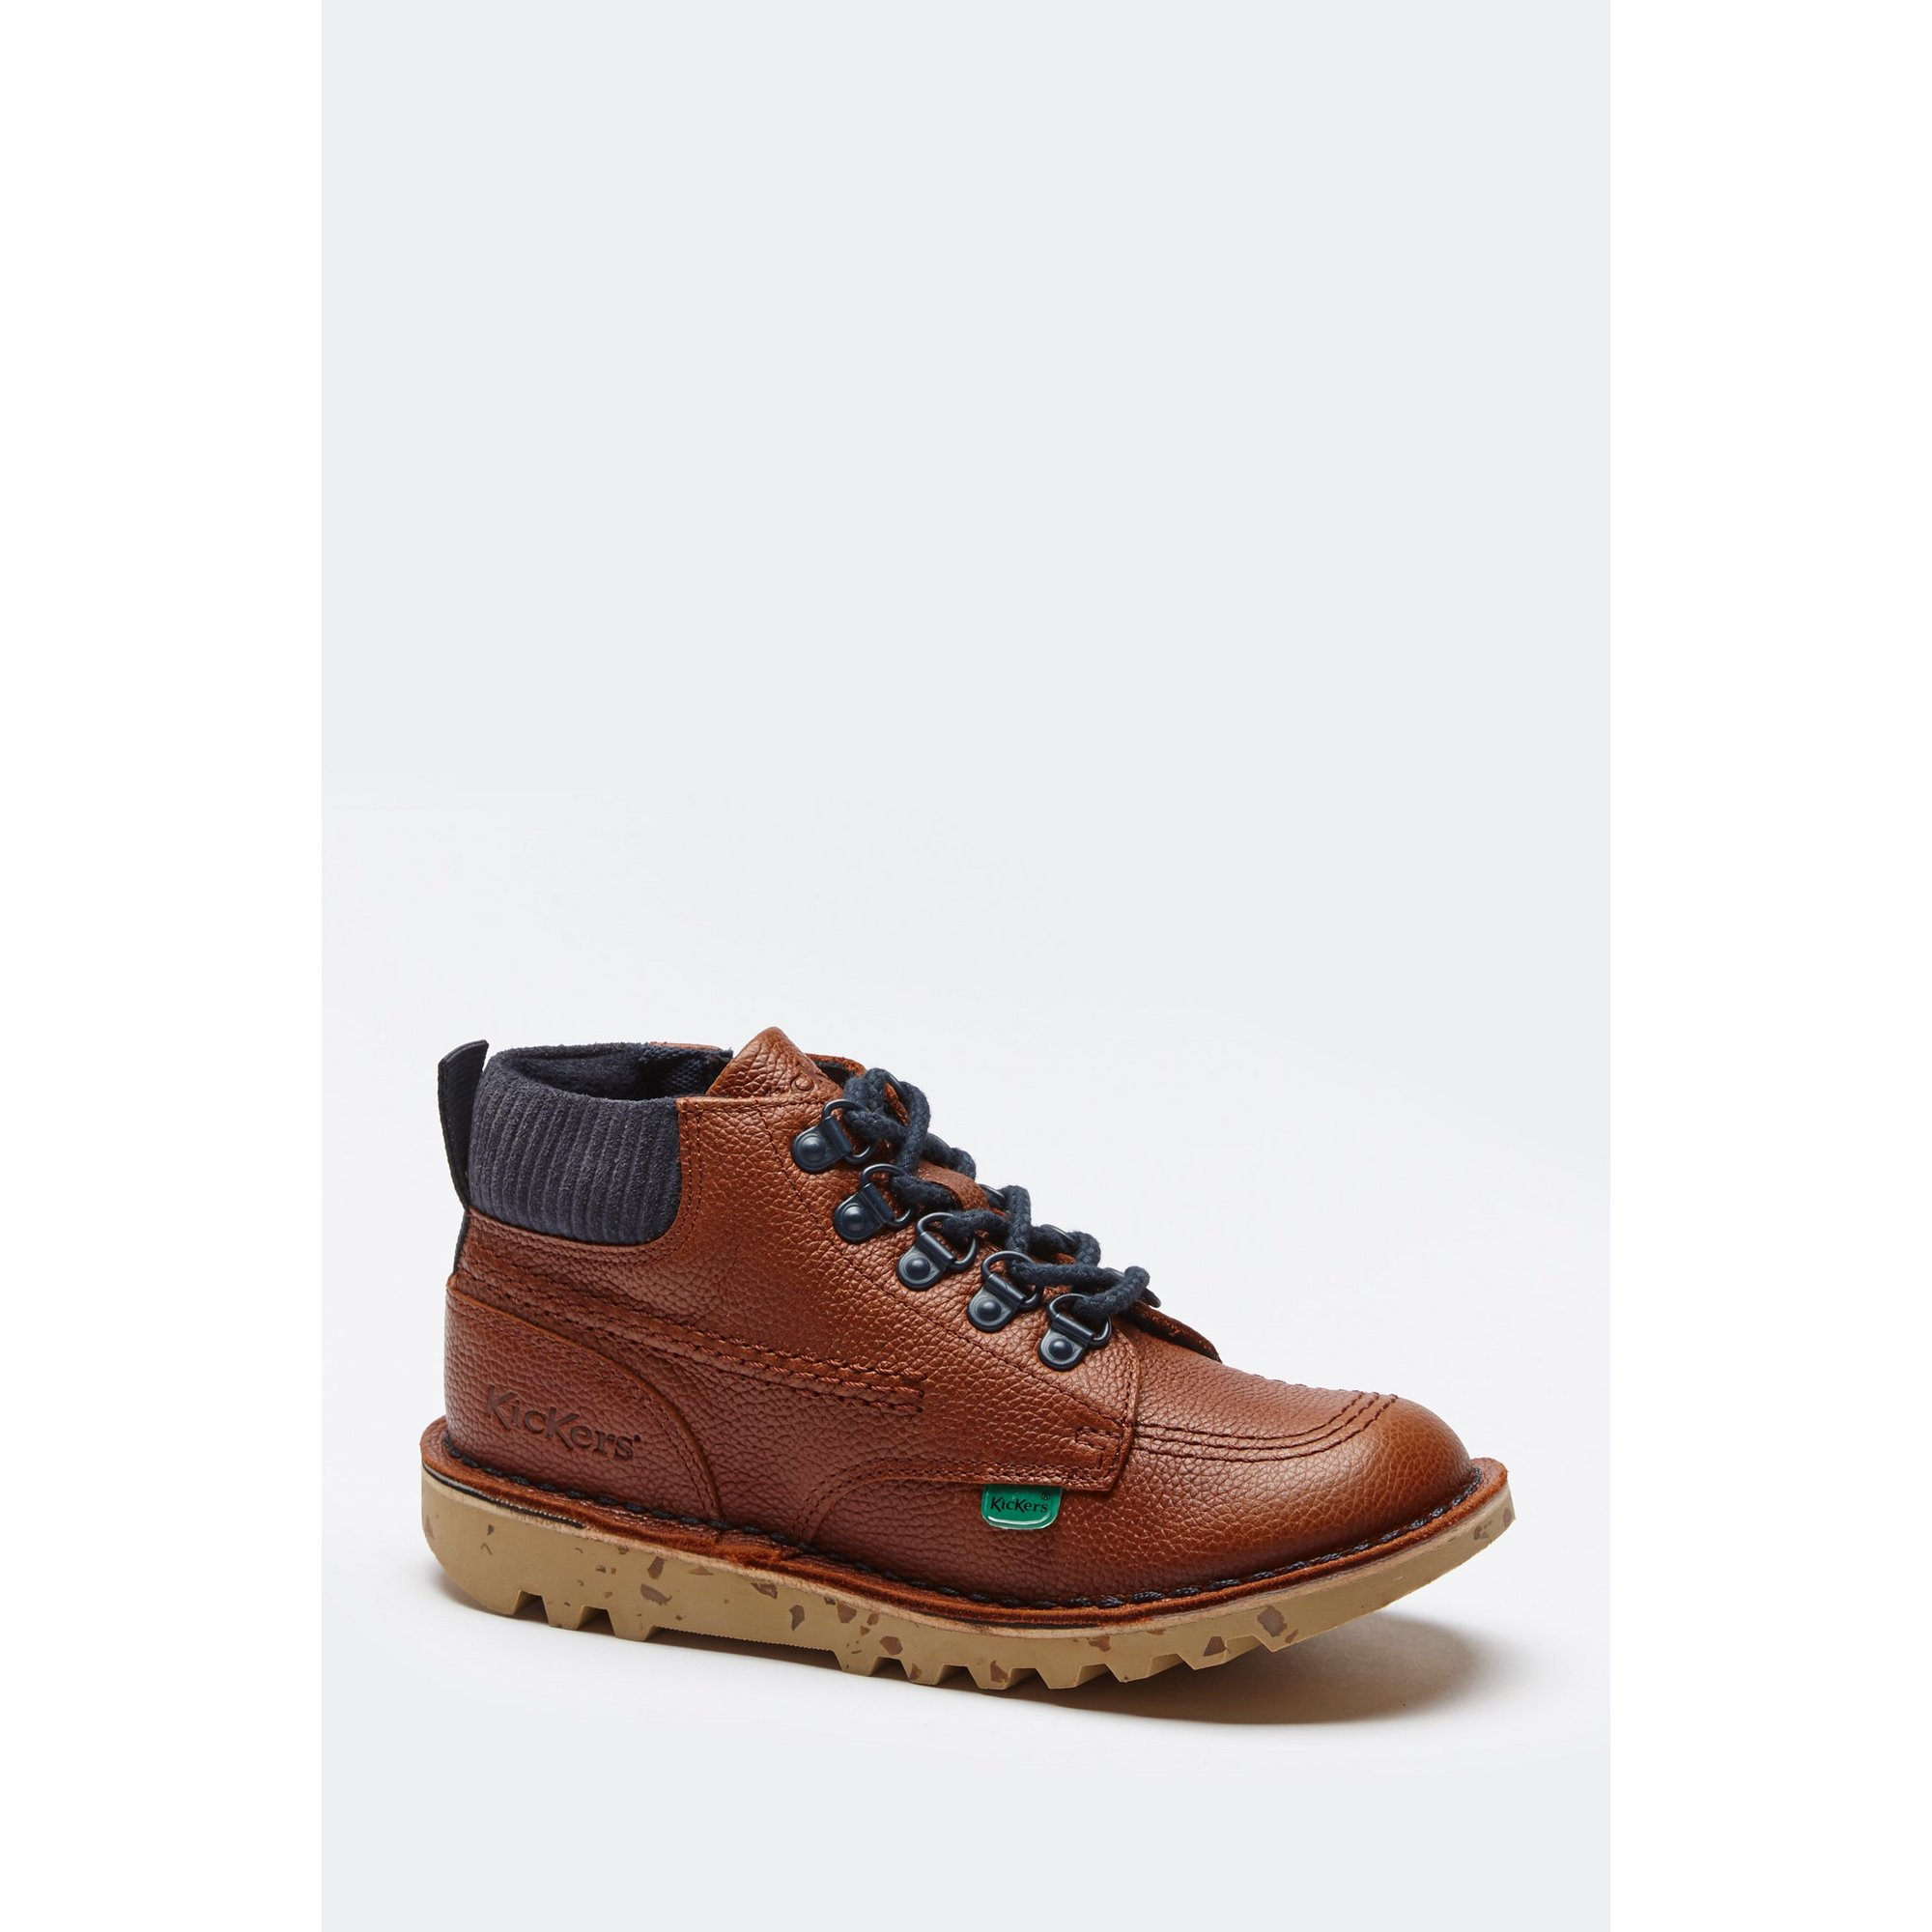 Image of Kickers Kick Hi Winter Boots